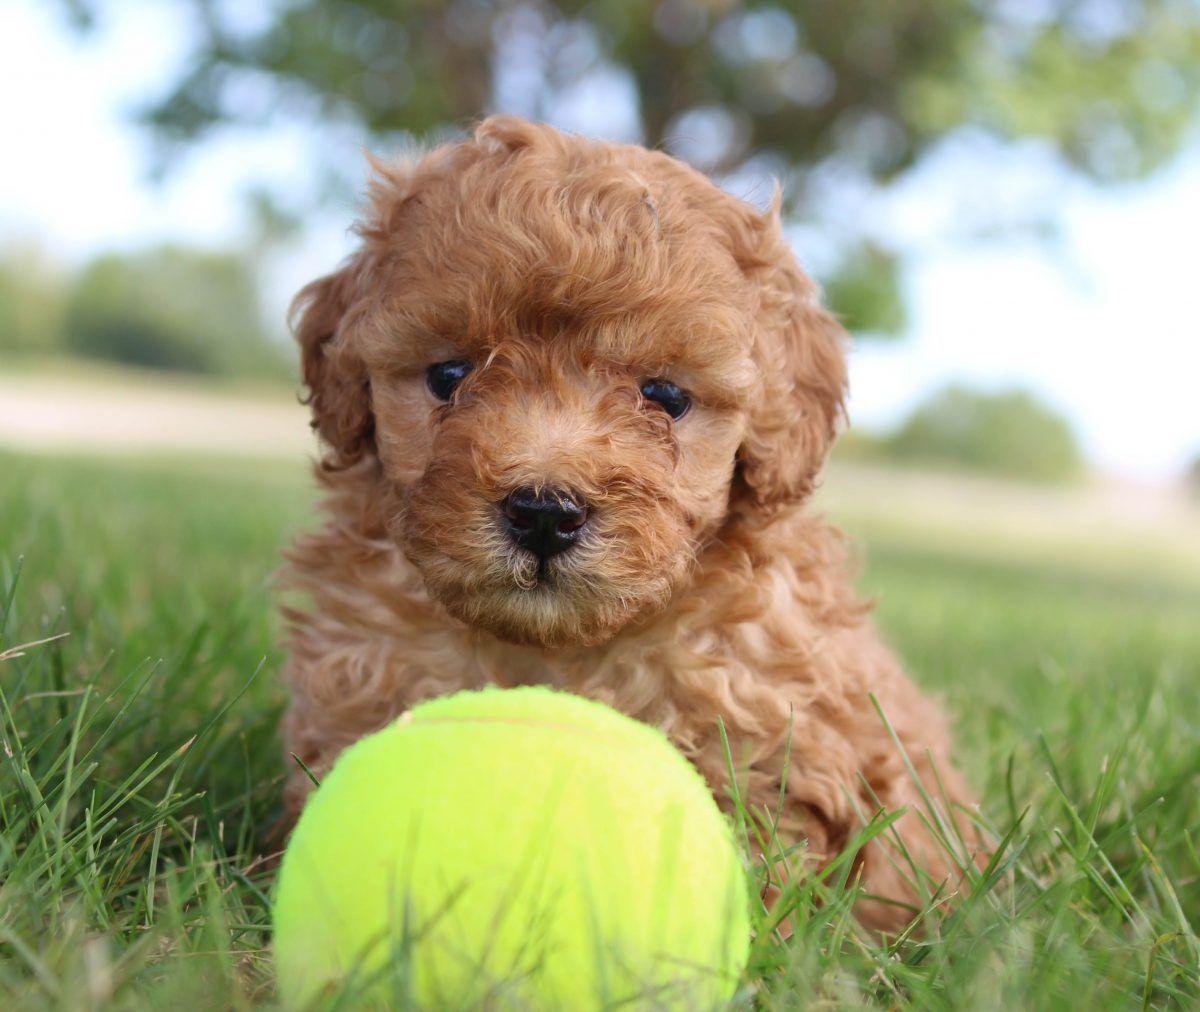 Parr Puppy Miniature Poodles For Sale In Shipshewana Indiana Poodle Puppy Miniature Poodle Puppy Mini Puppies